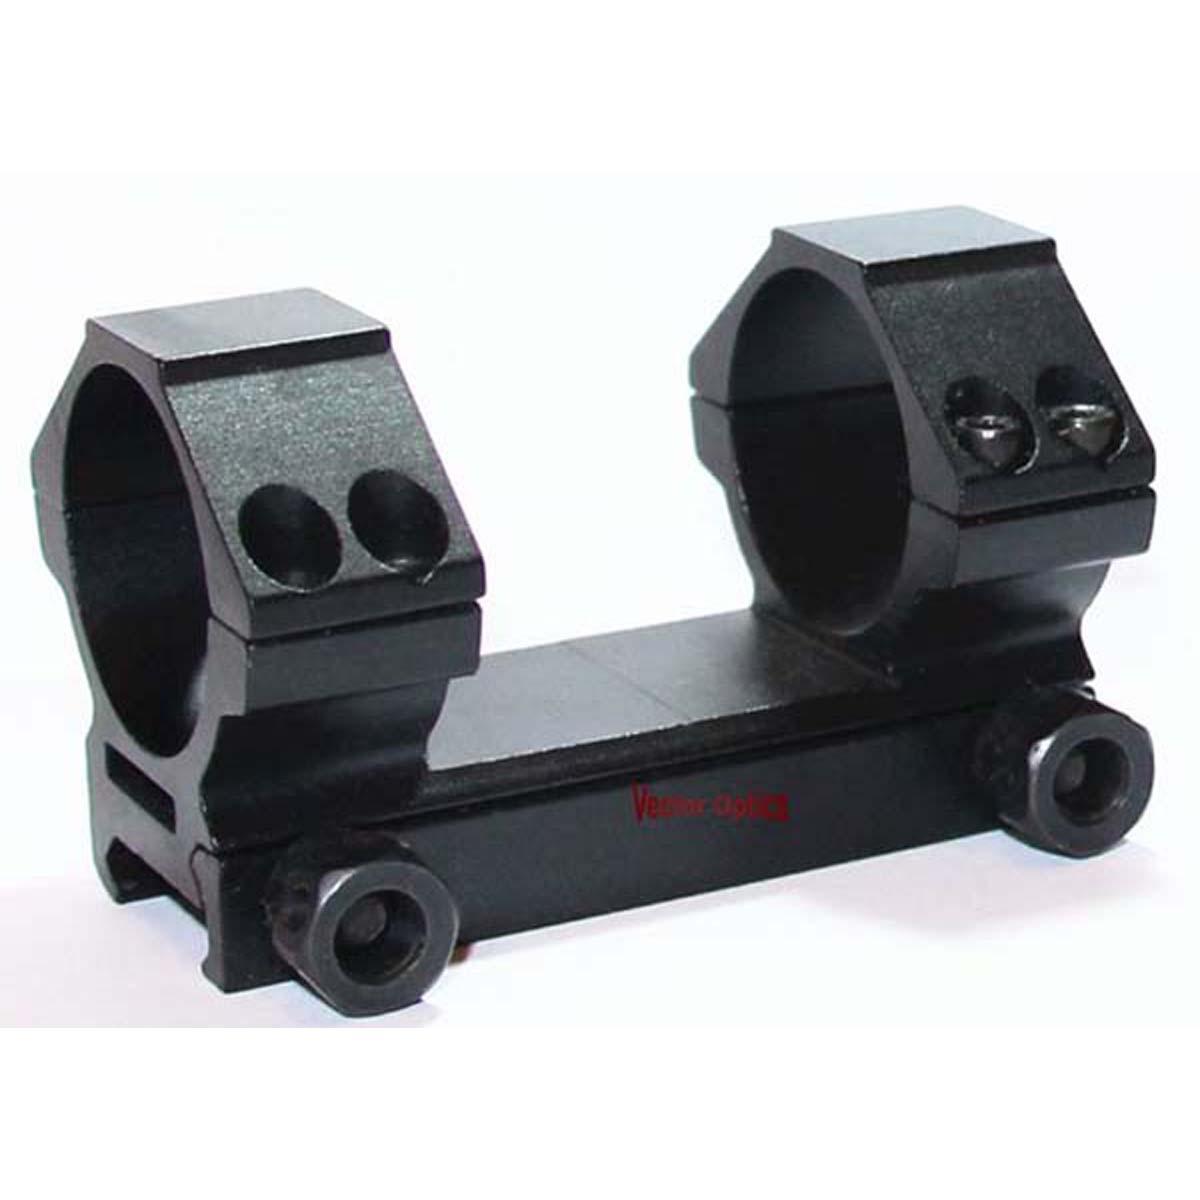 30mm OnePiece Short Weaver Mount